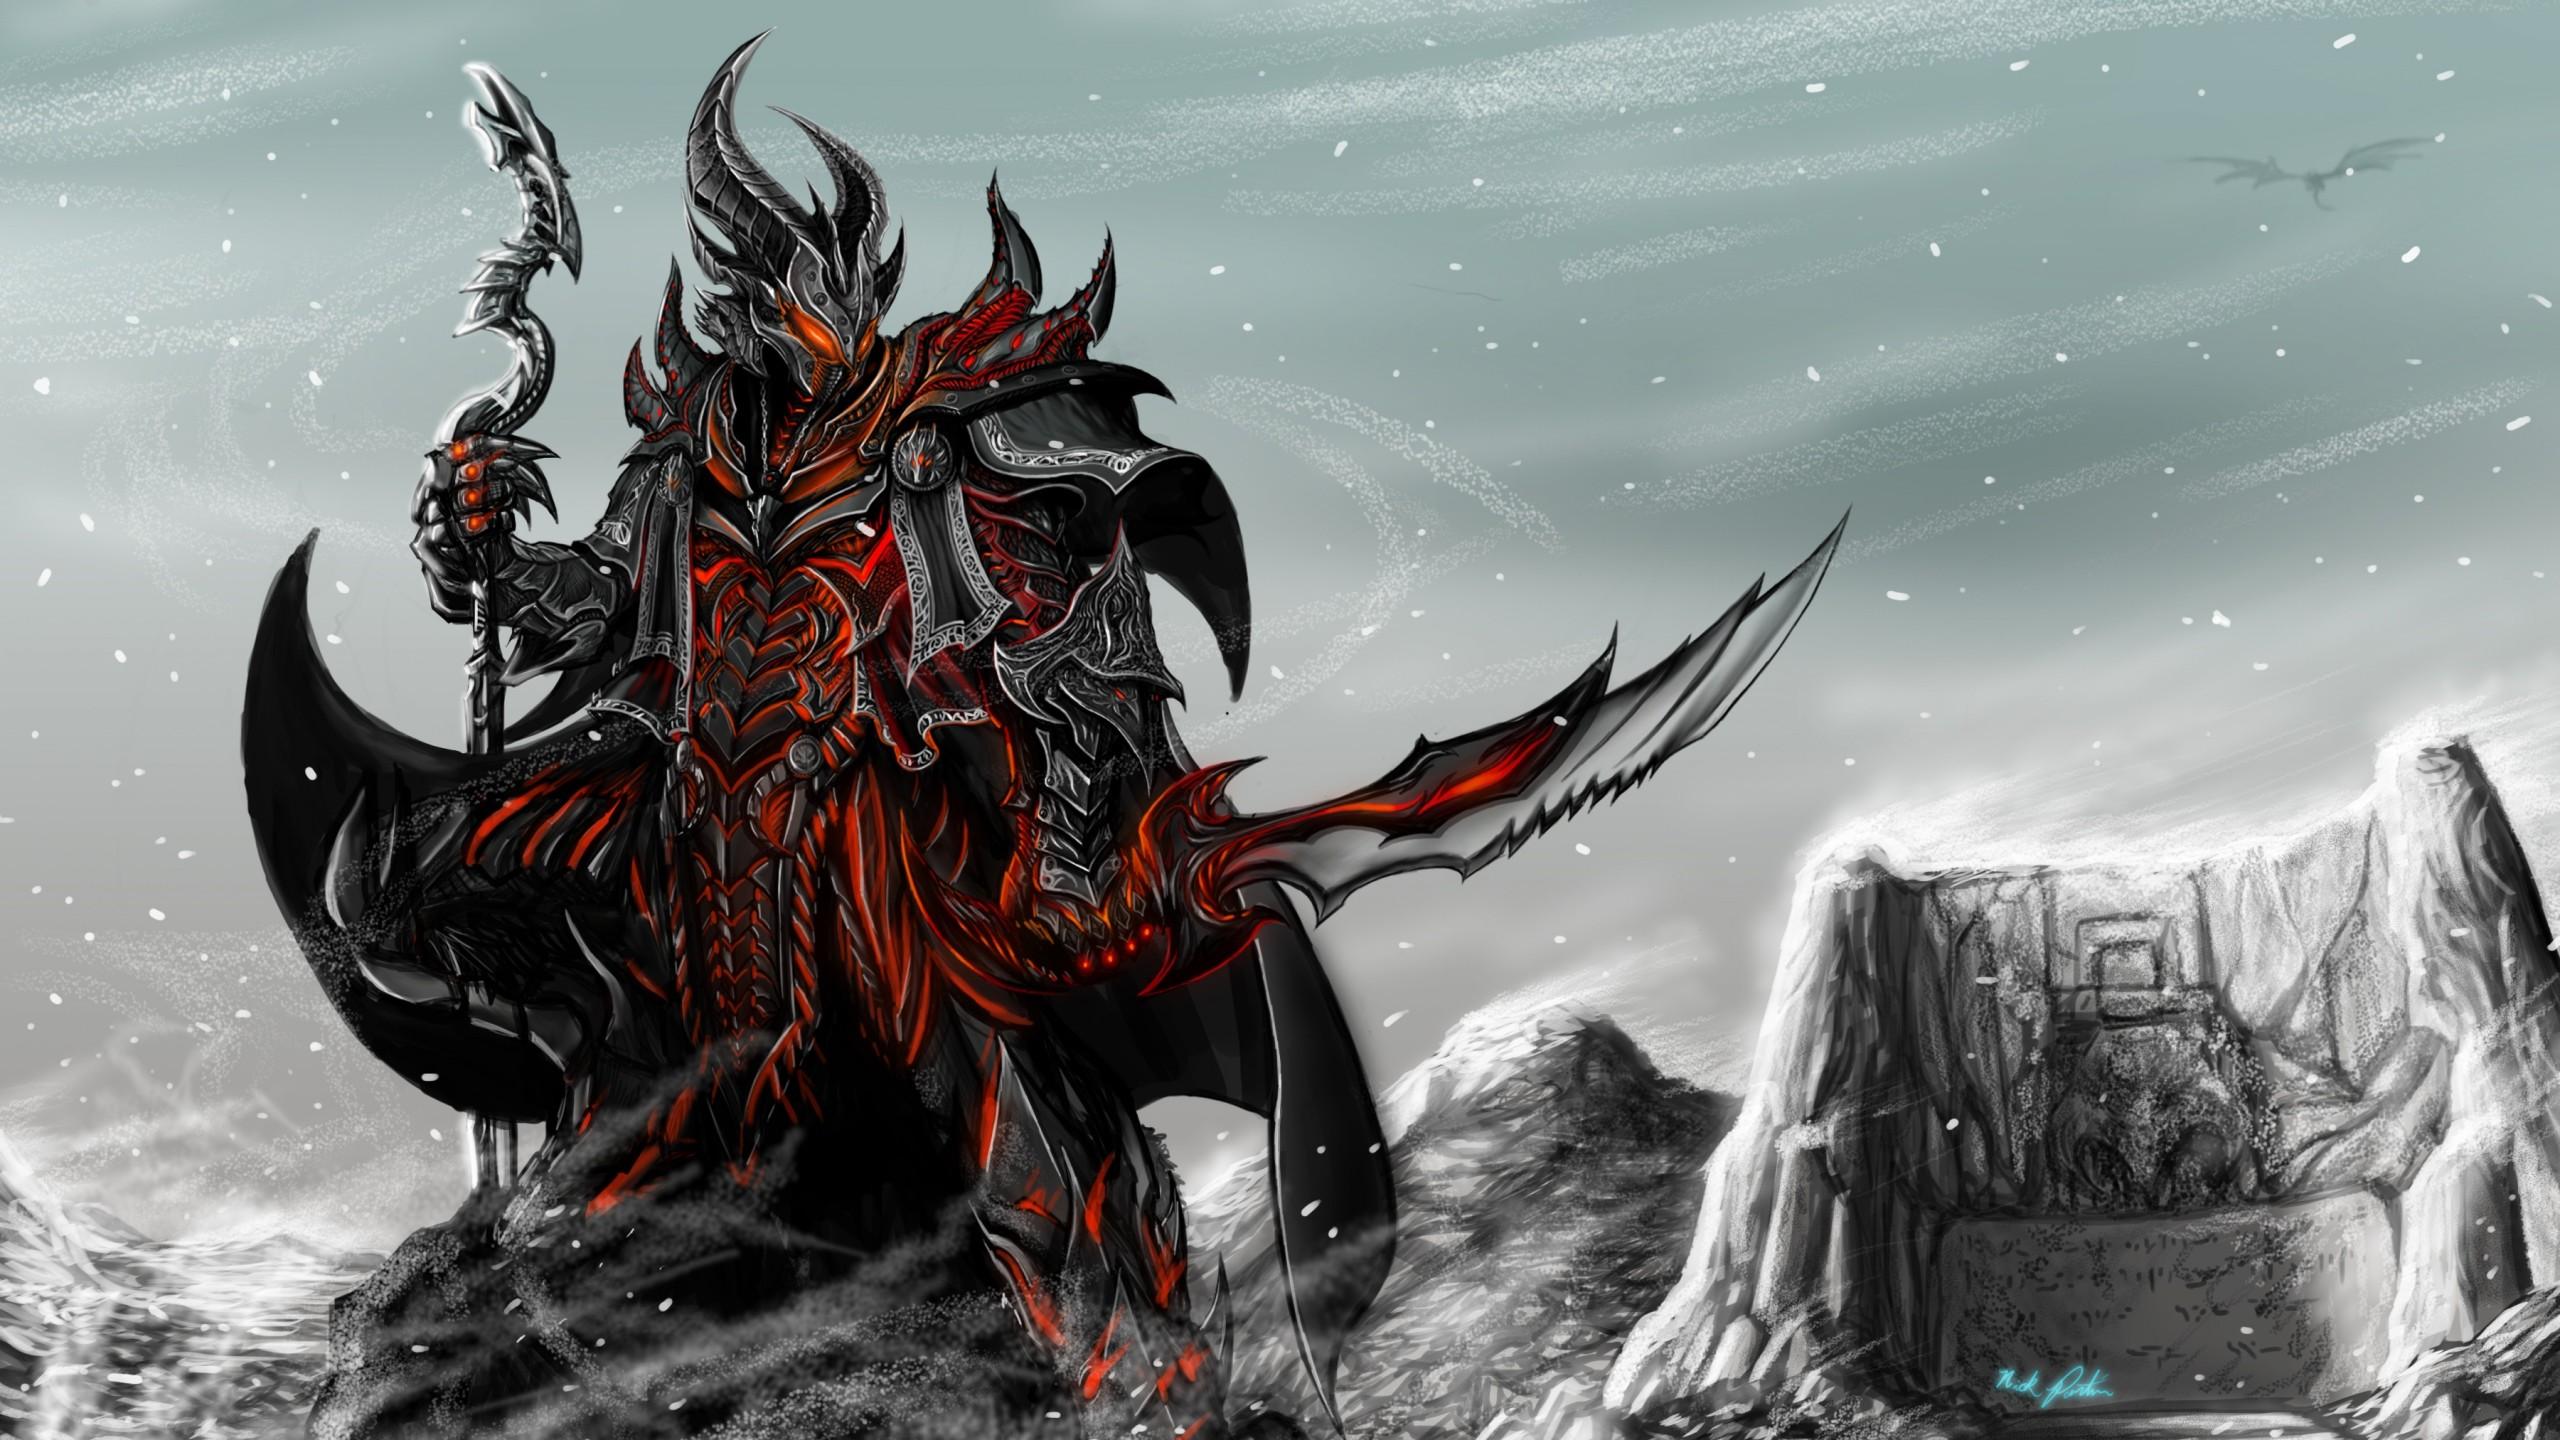 Wallpaper skyrim, game, art, rider, armor, staff, sword